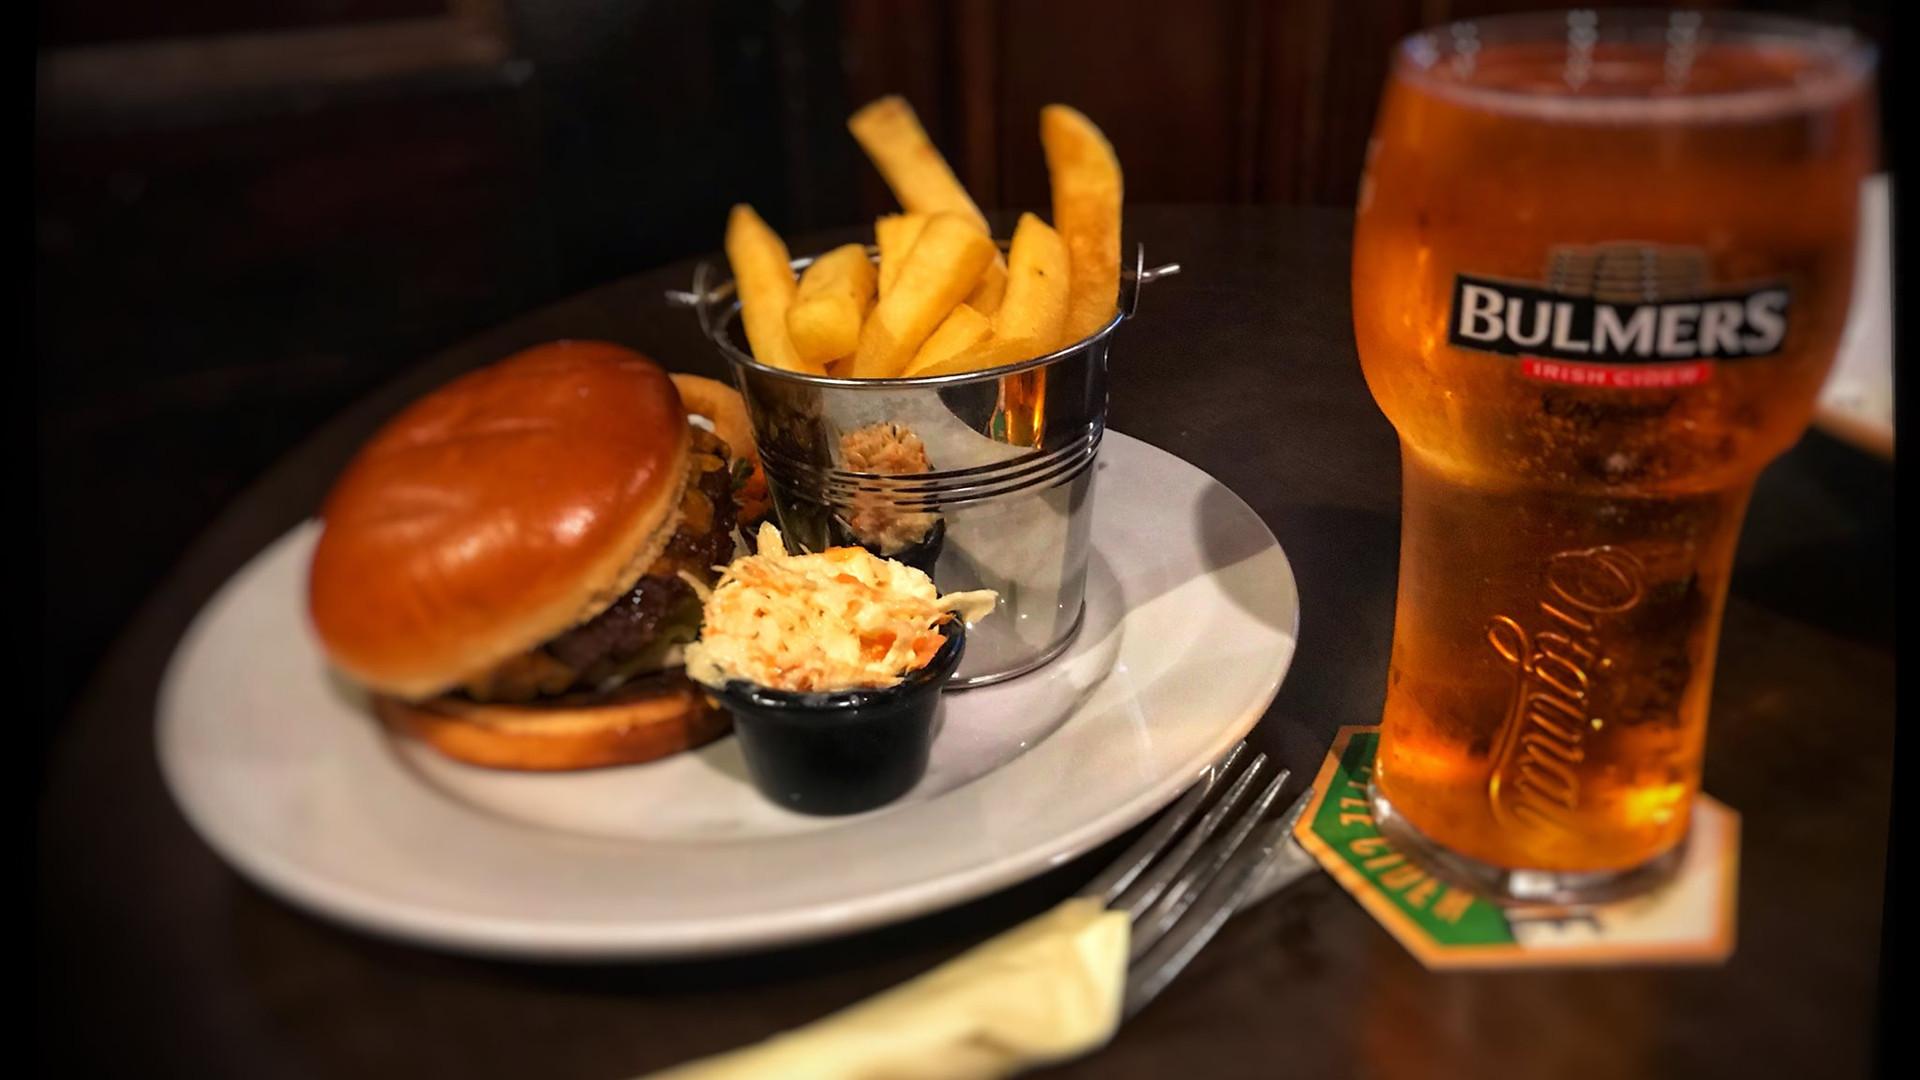 Burger & Bulmers.jpg